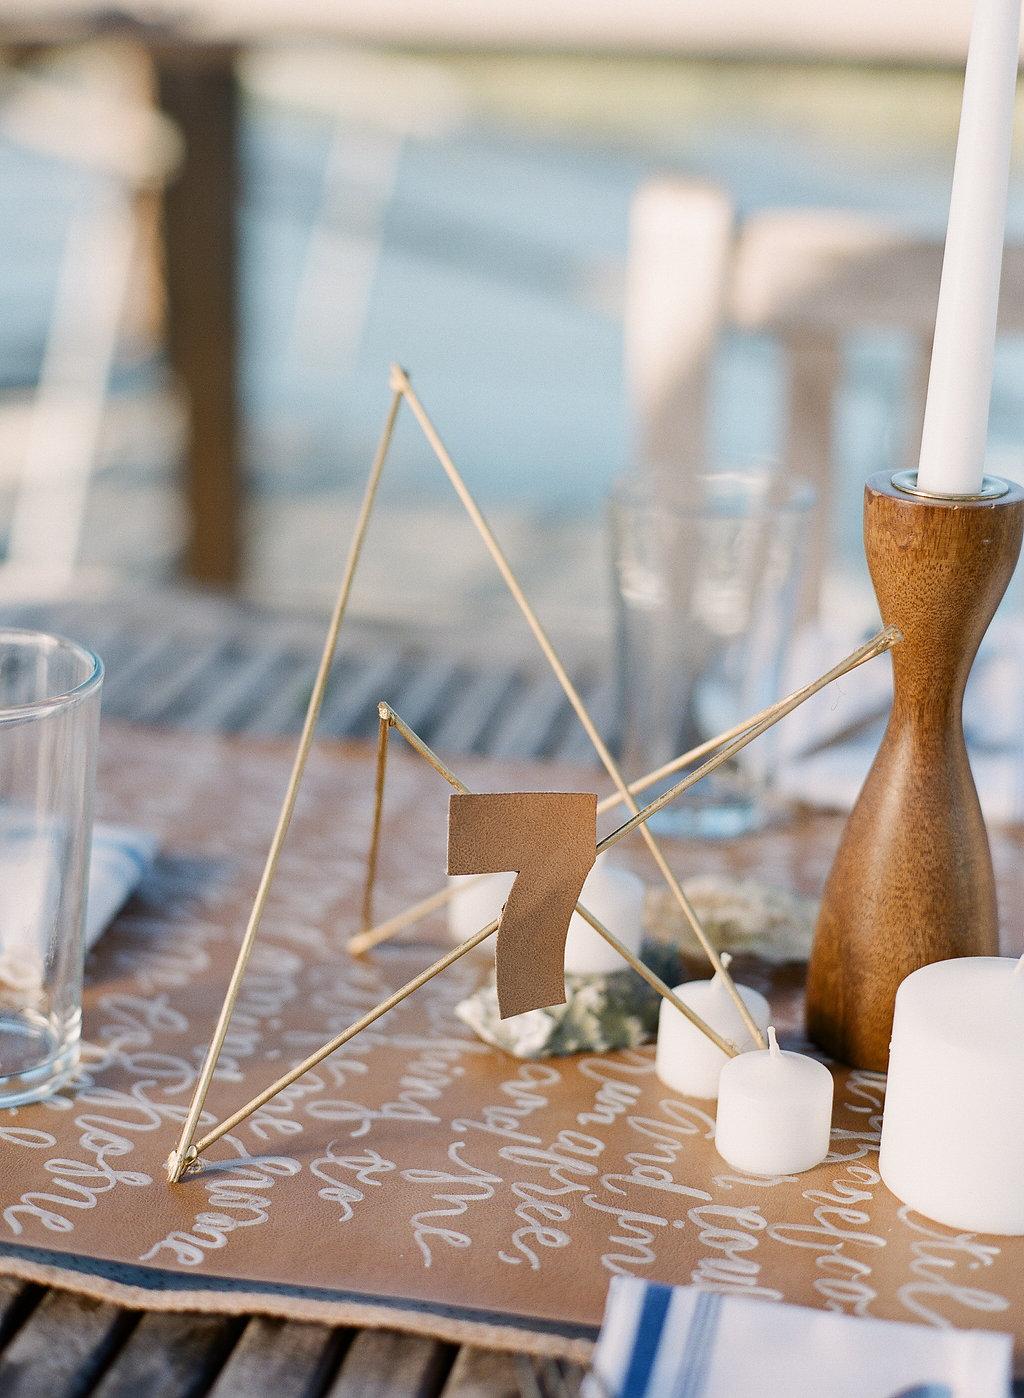 diy-wedding-table-number-geometric-shapes-table-number-the-wyld-dock-bar-wedding-inspiration-rustic-outdoor-wedding-ivory-and-beau-savannah-wedding-planner-savannah-event-designer.jpg